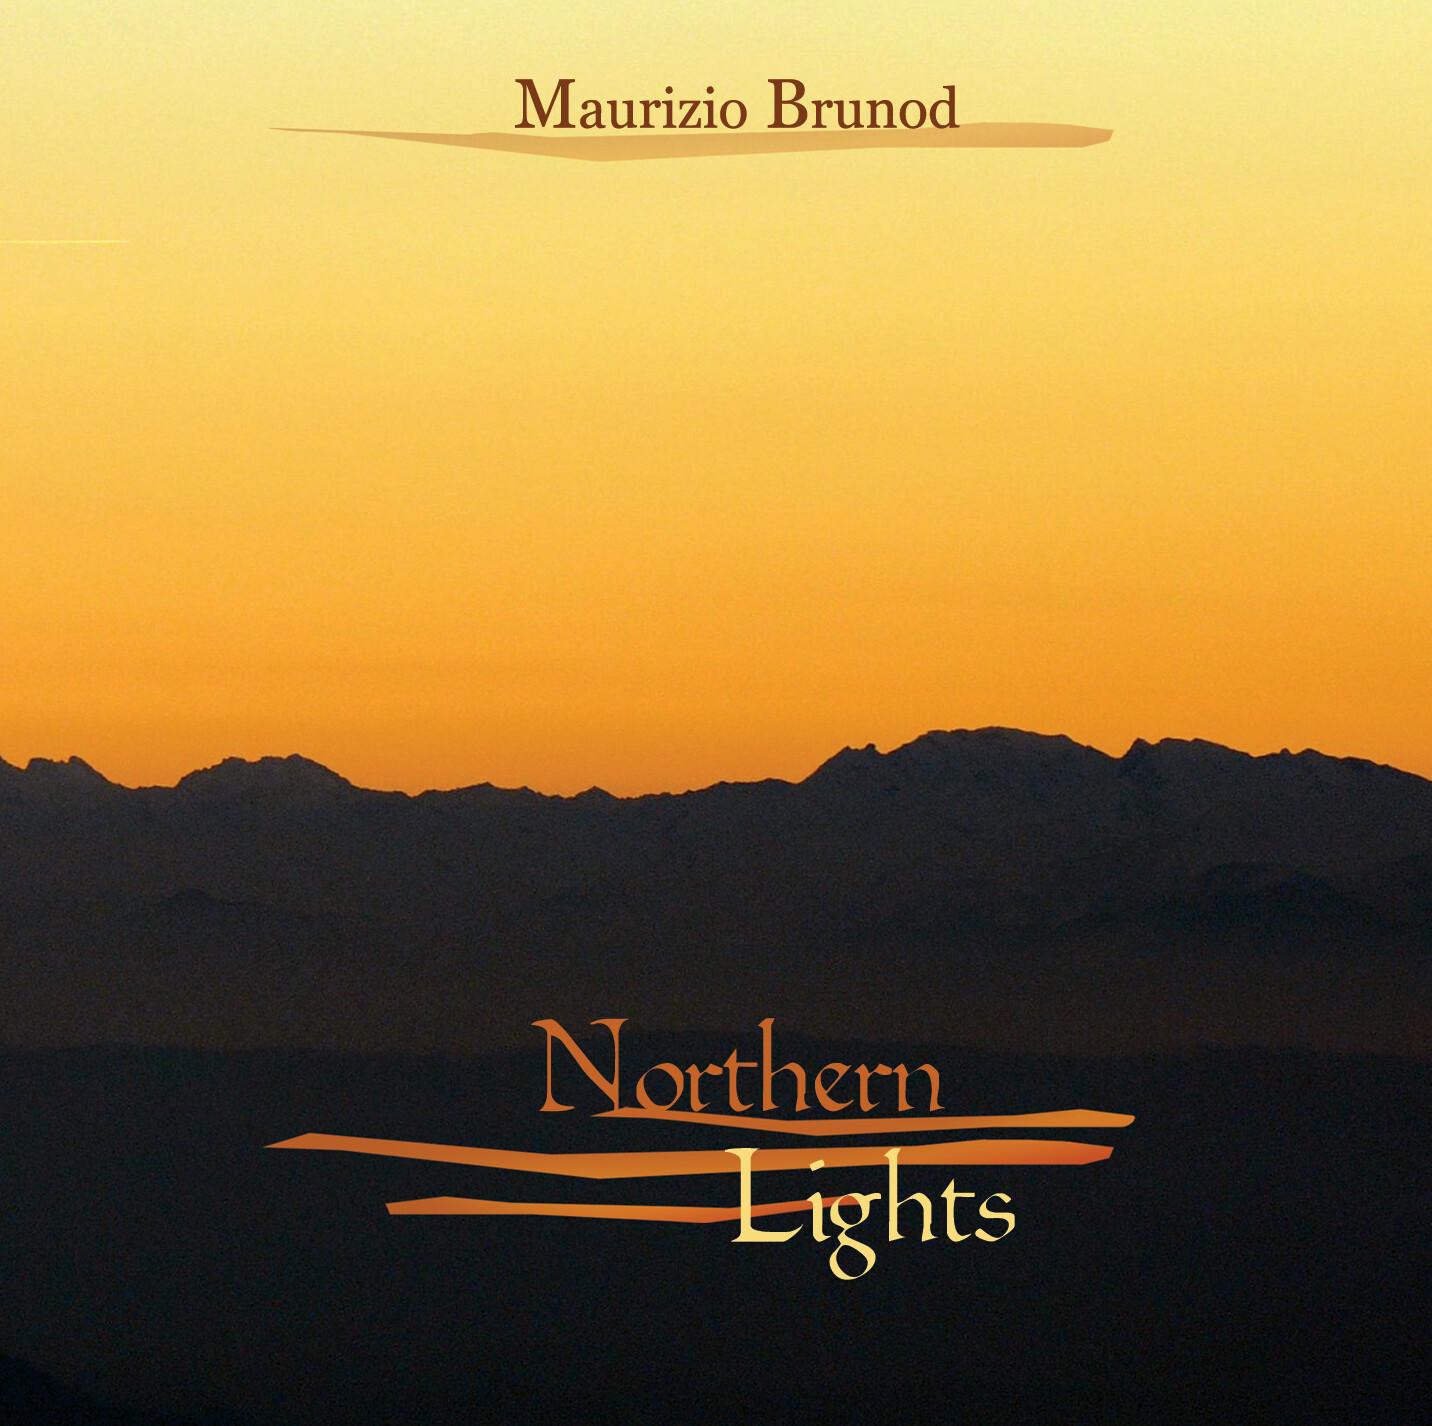 MAURIZIO BRUNOD «Northern lights»